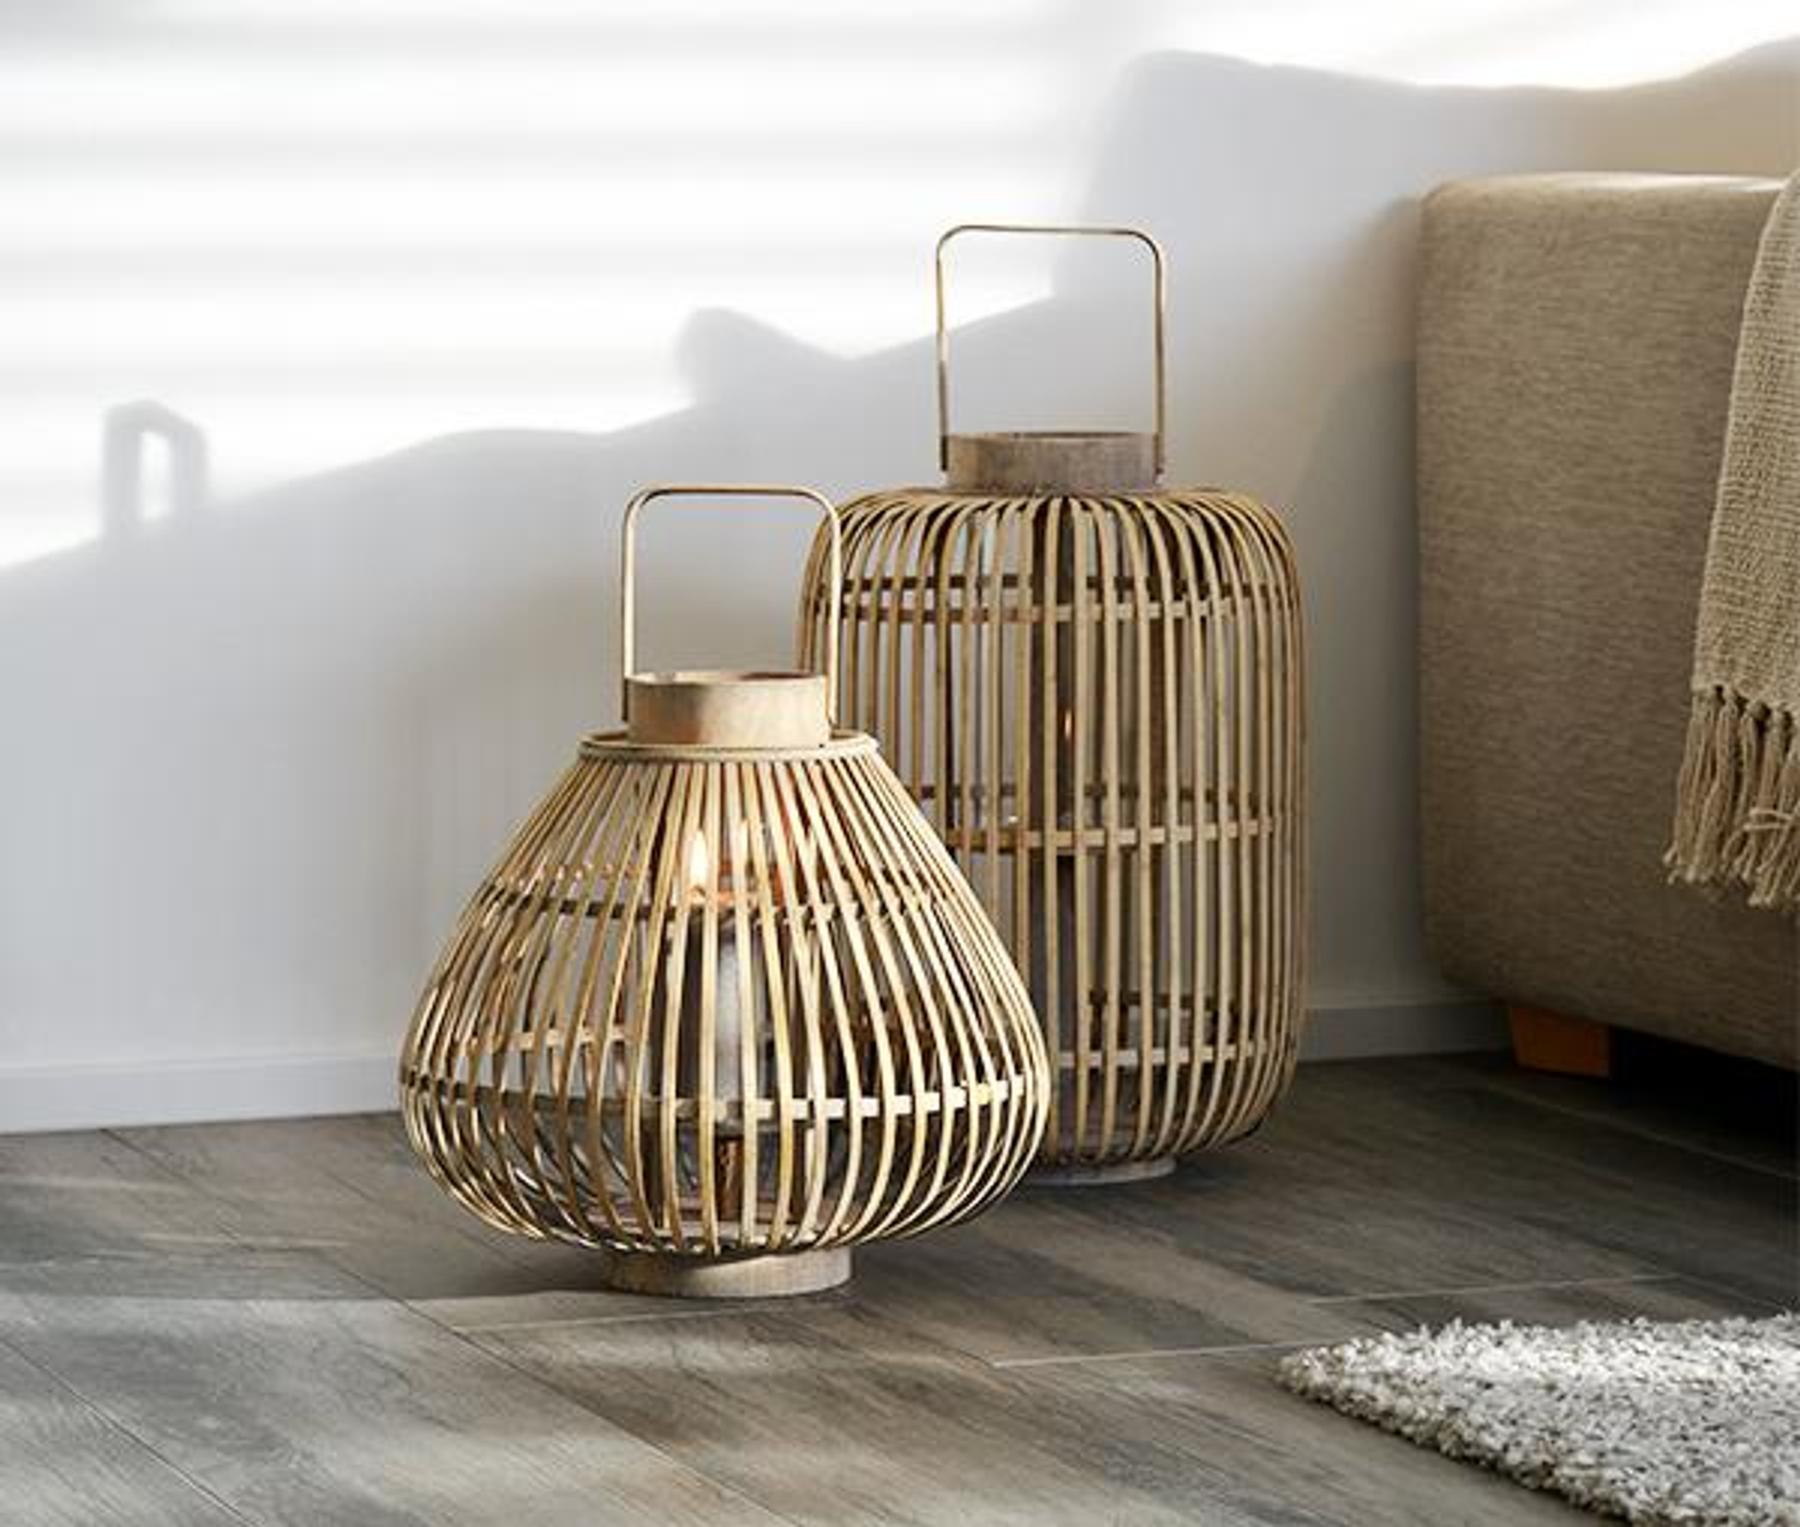 broste copenhagen windlicht tall sahara gro e laterne aus bambusholz tujuh sch ne dinge. Black Bedroom Furniture Sets. Home Design Ideas